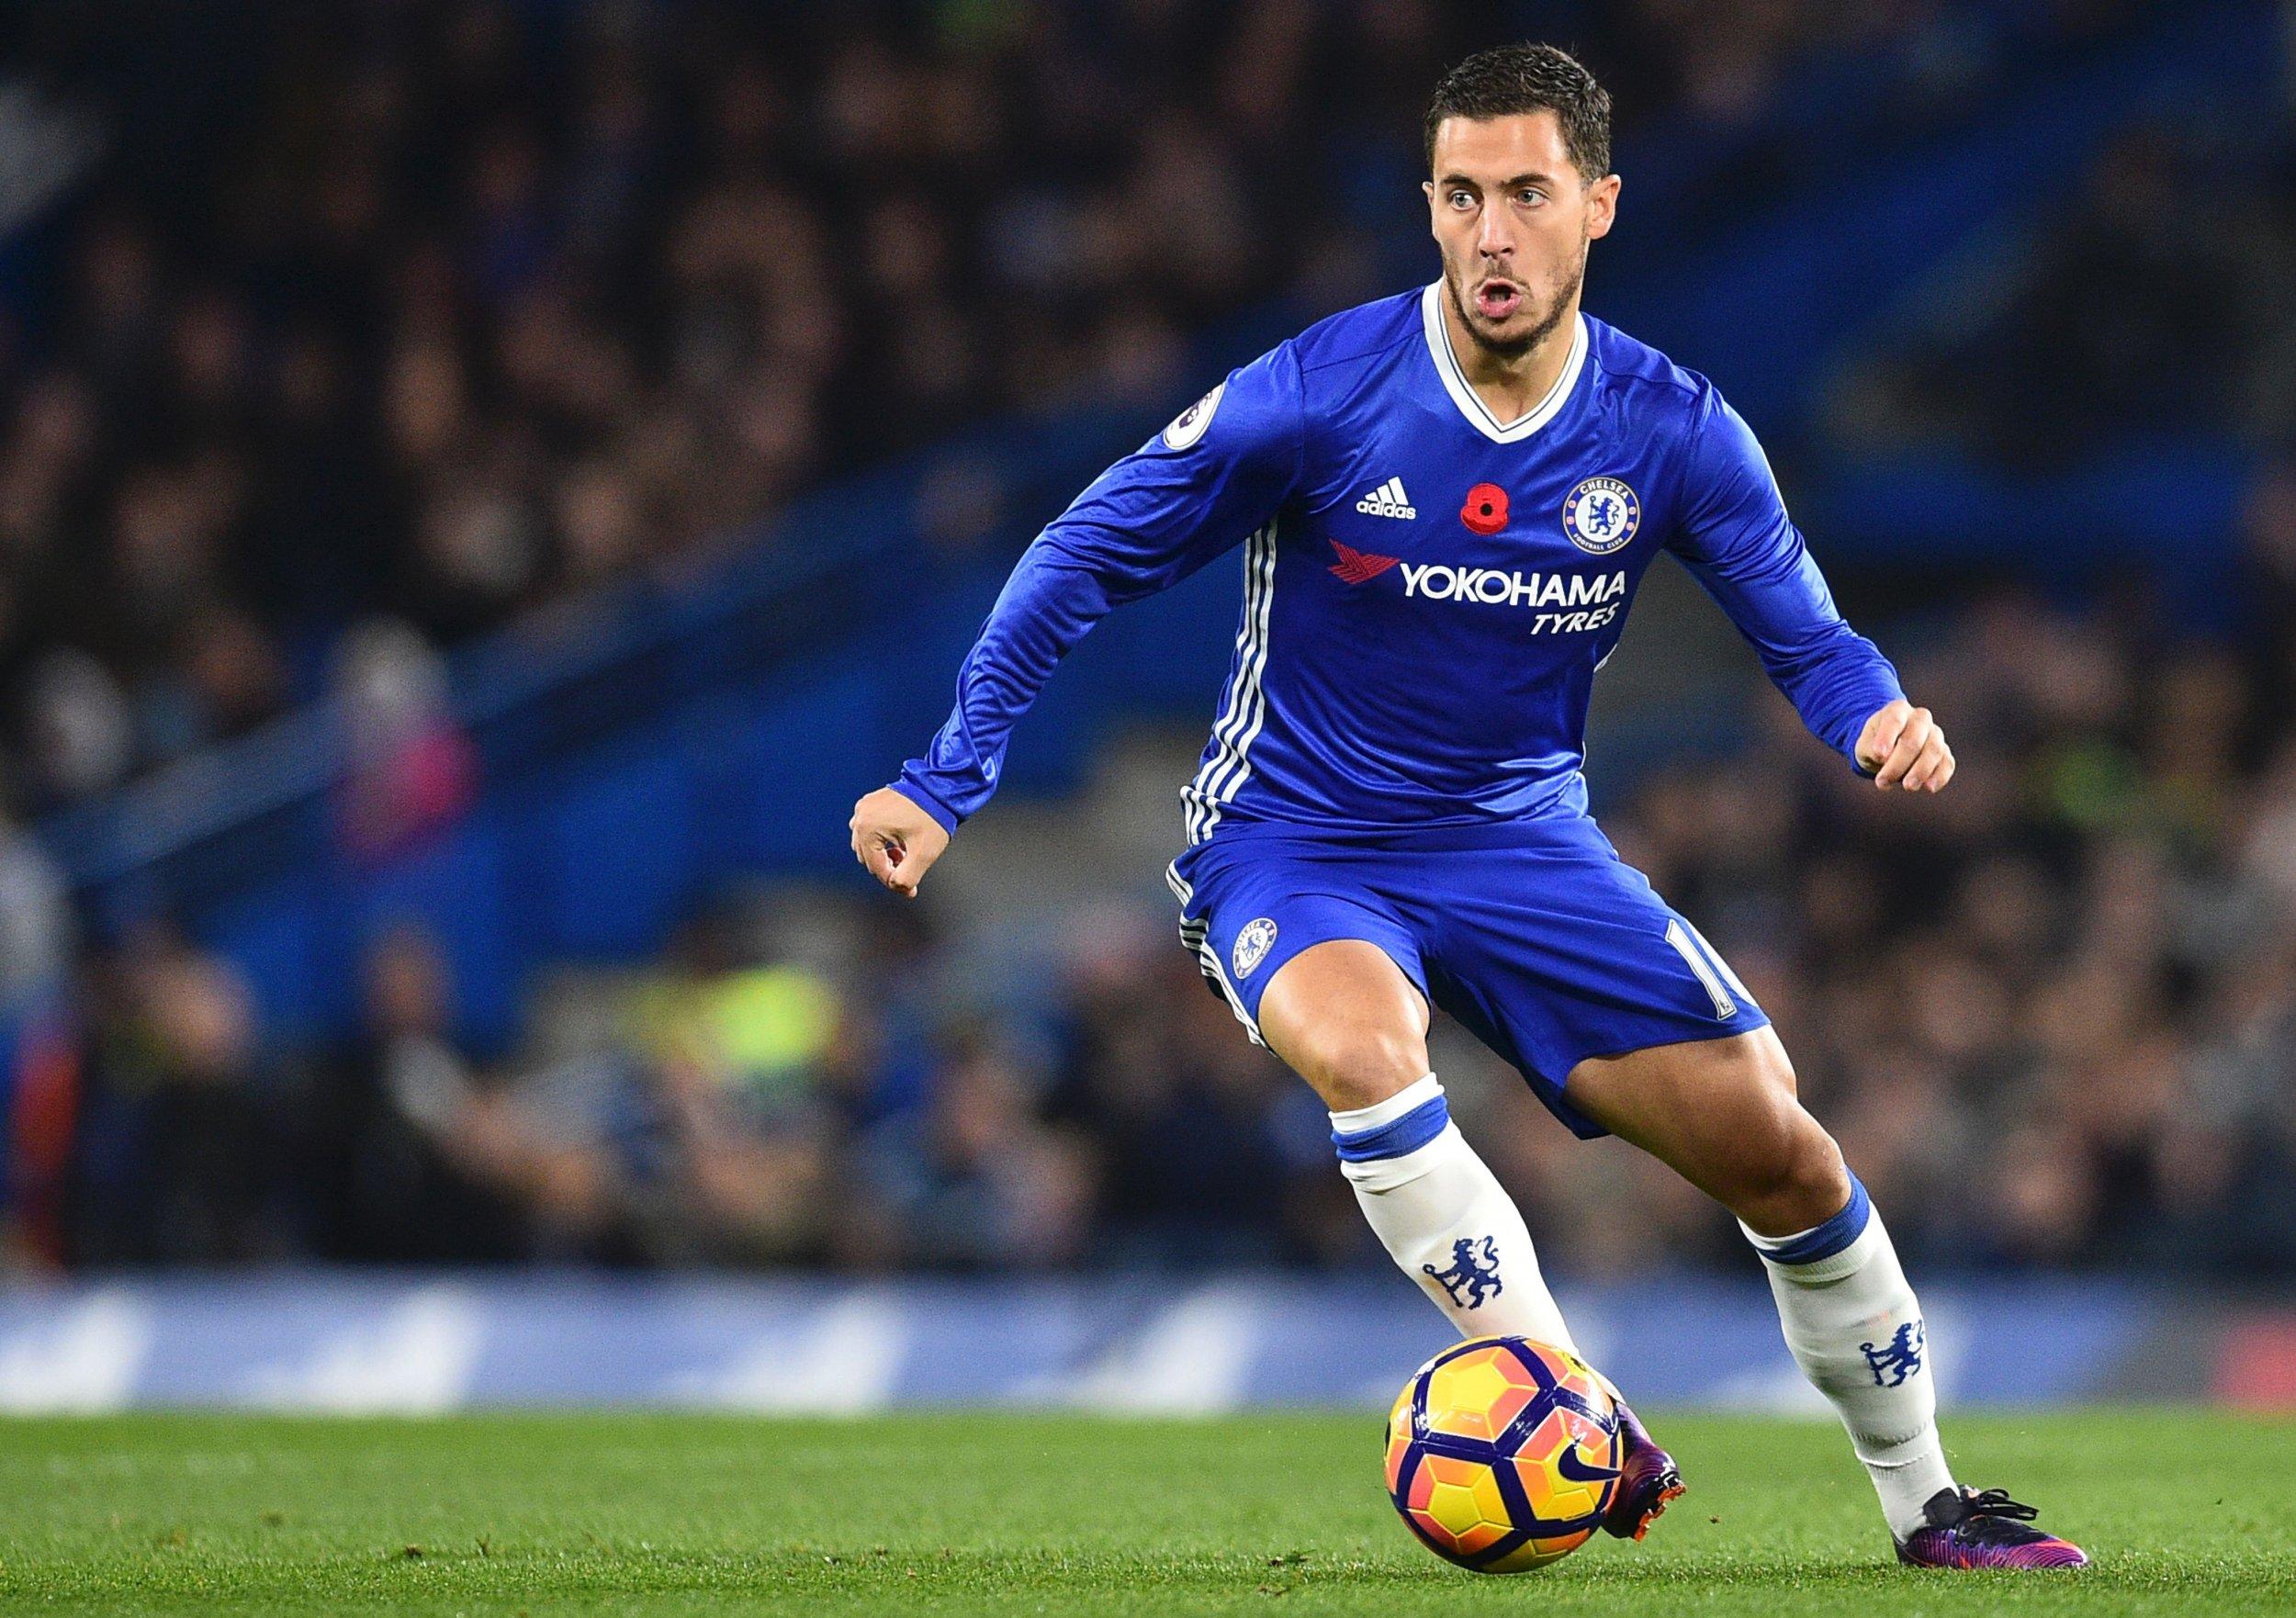 Eden Hazard: What I Want to Achieve at Chelsea This Season